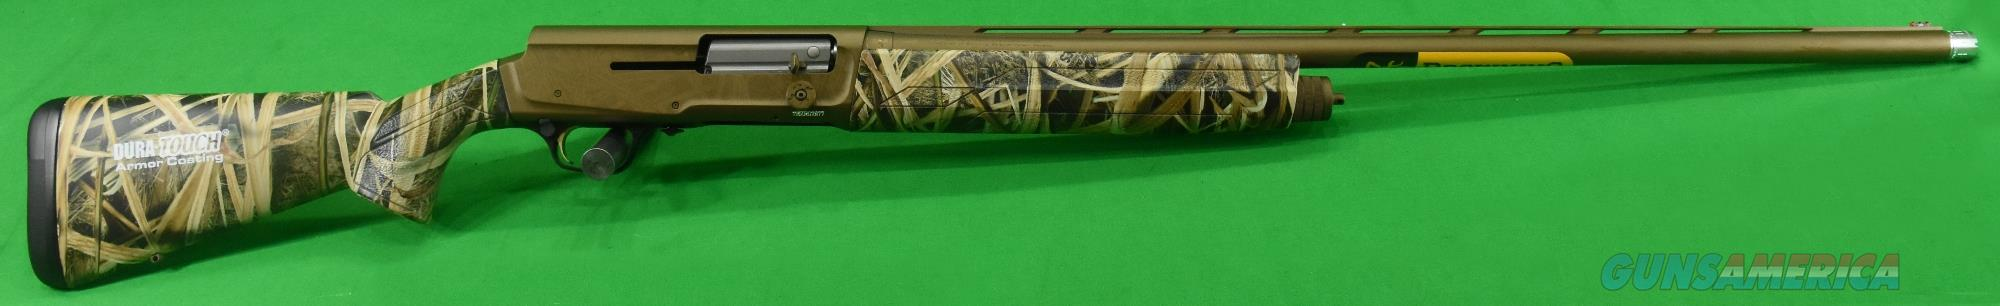 0118412003 Browning A5 Wicked Wing Blades Camo 12 Ga 30-3.5In  Guns > Shotguns > Browning Shotguns > Autoloaders > Hunting